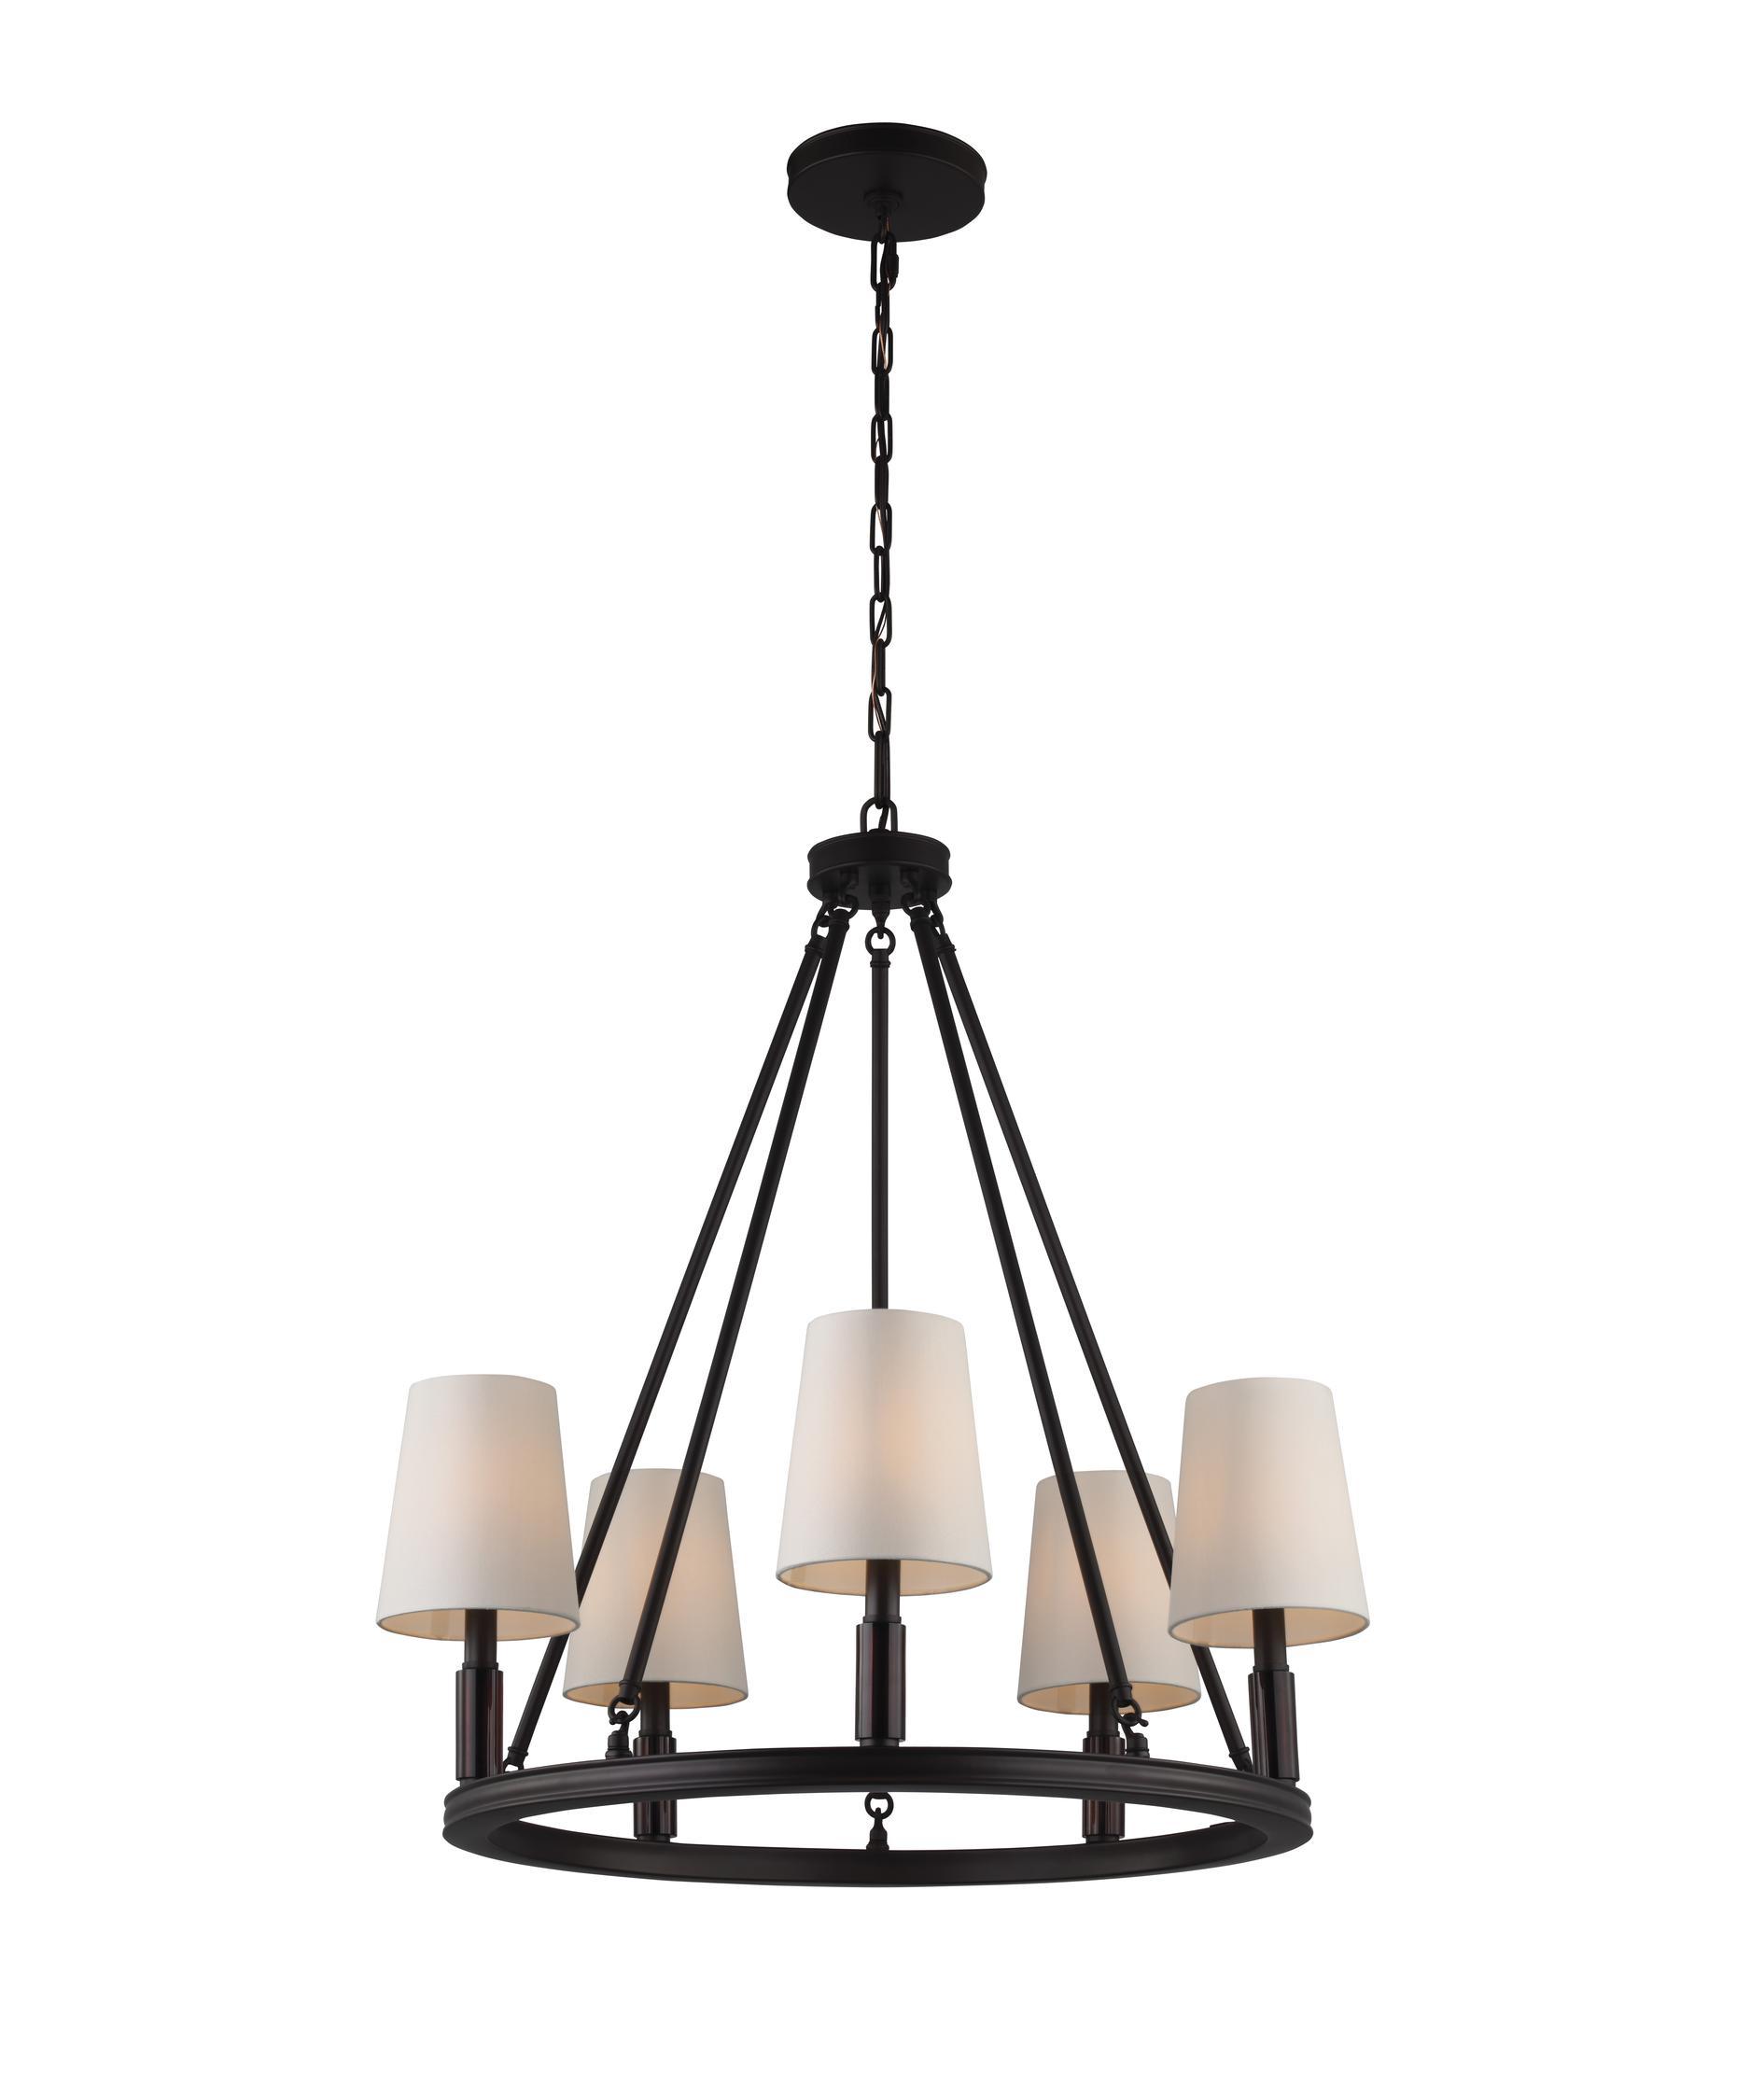 murray feiss f29225 lismore 28 inch wide 5 light chandelier capitol lighting - Feiss Lighting